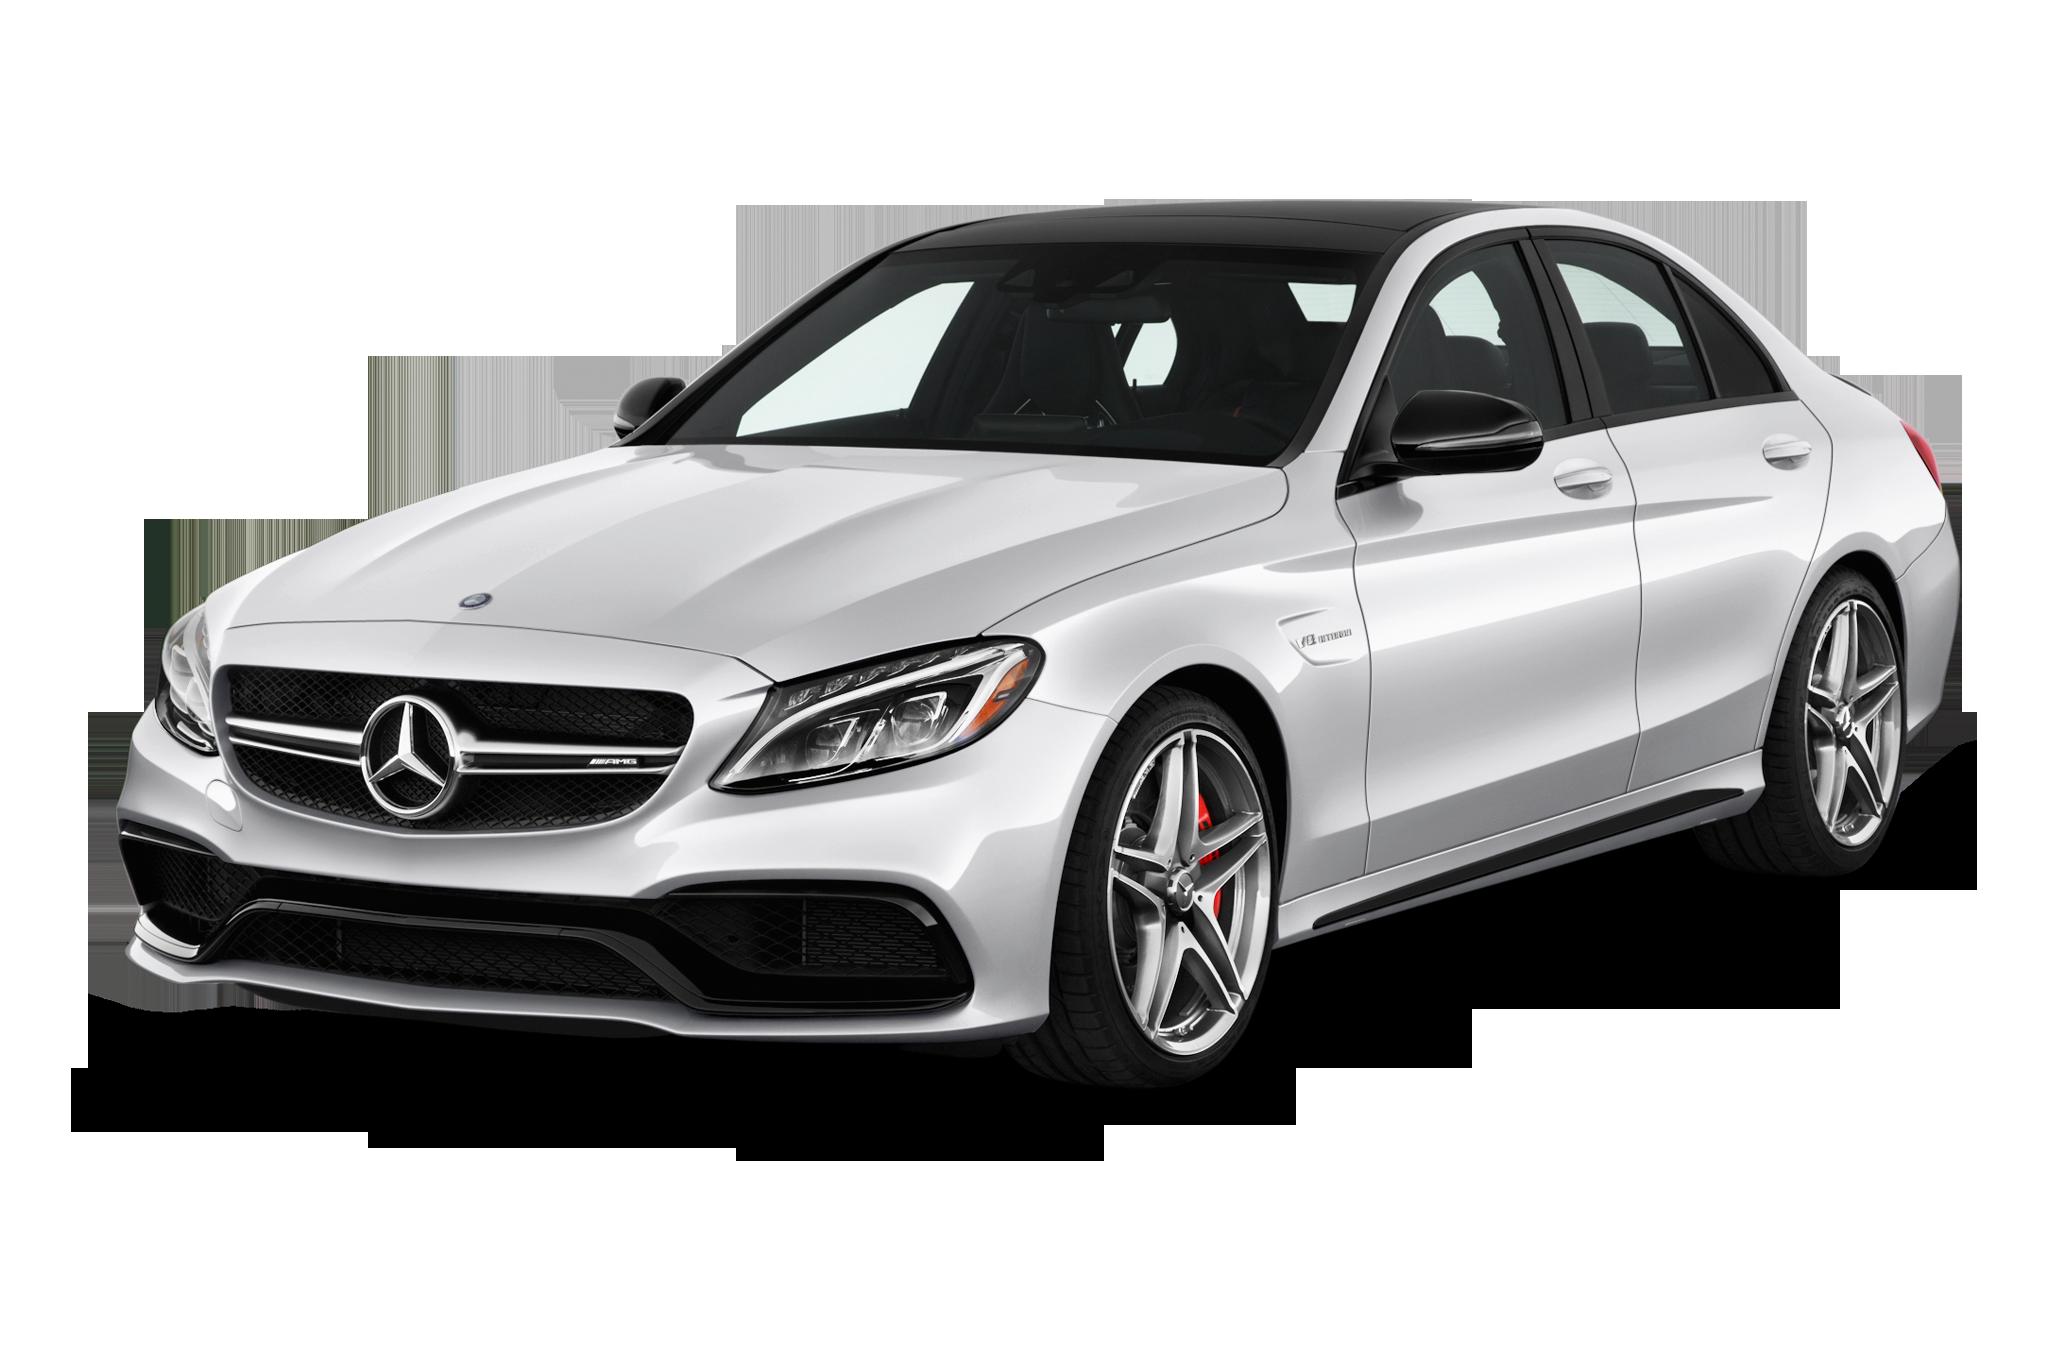 2018 Mercedes-Benz C-Class Spied with Tweaks | Automobile ...